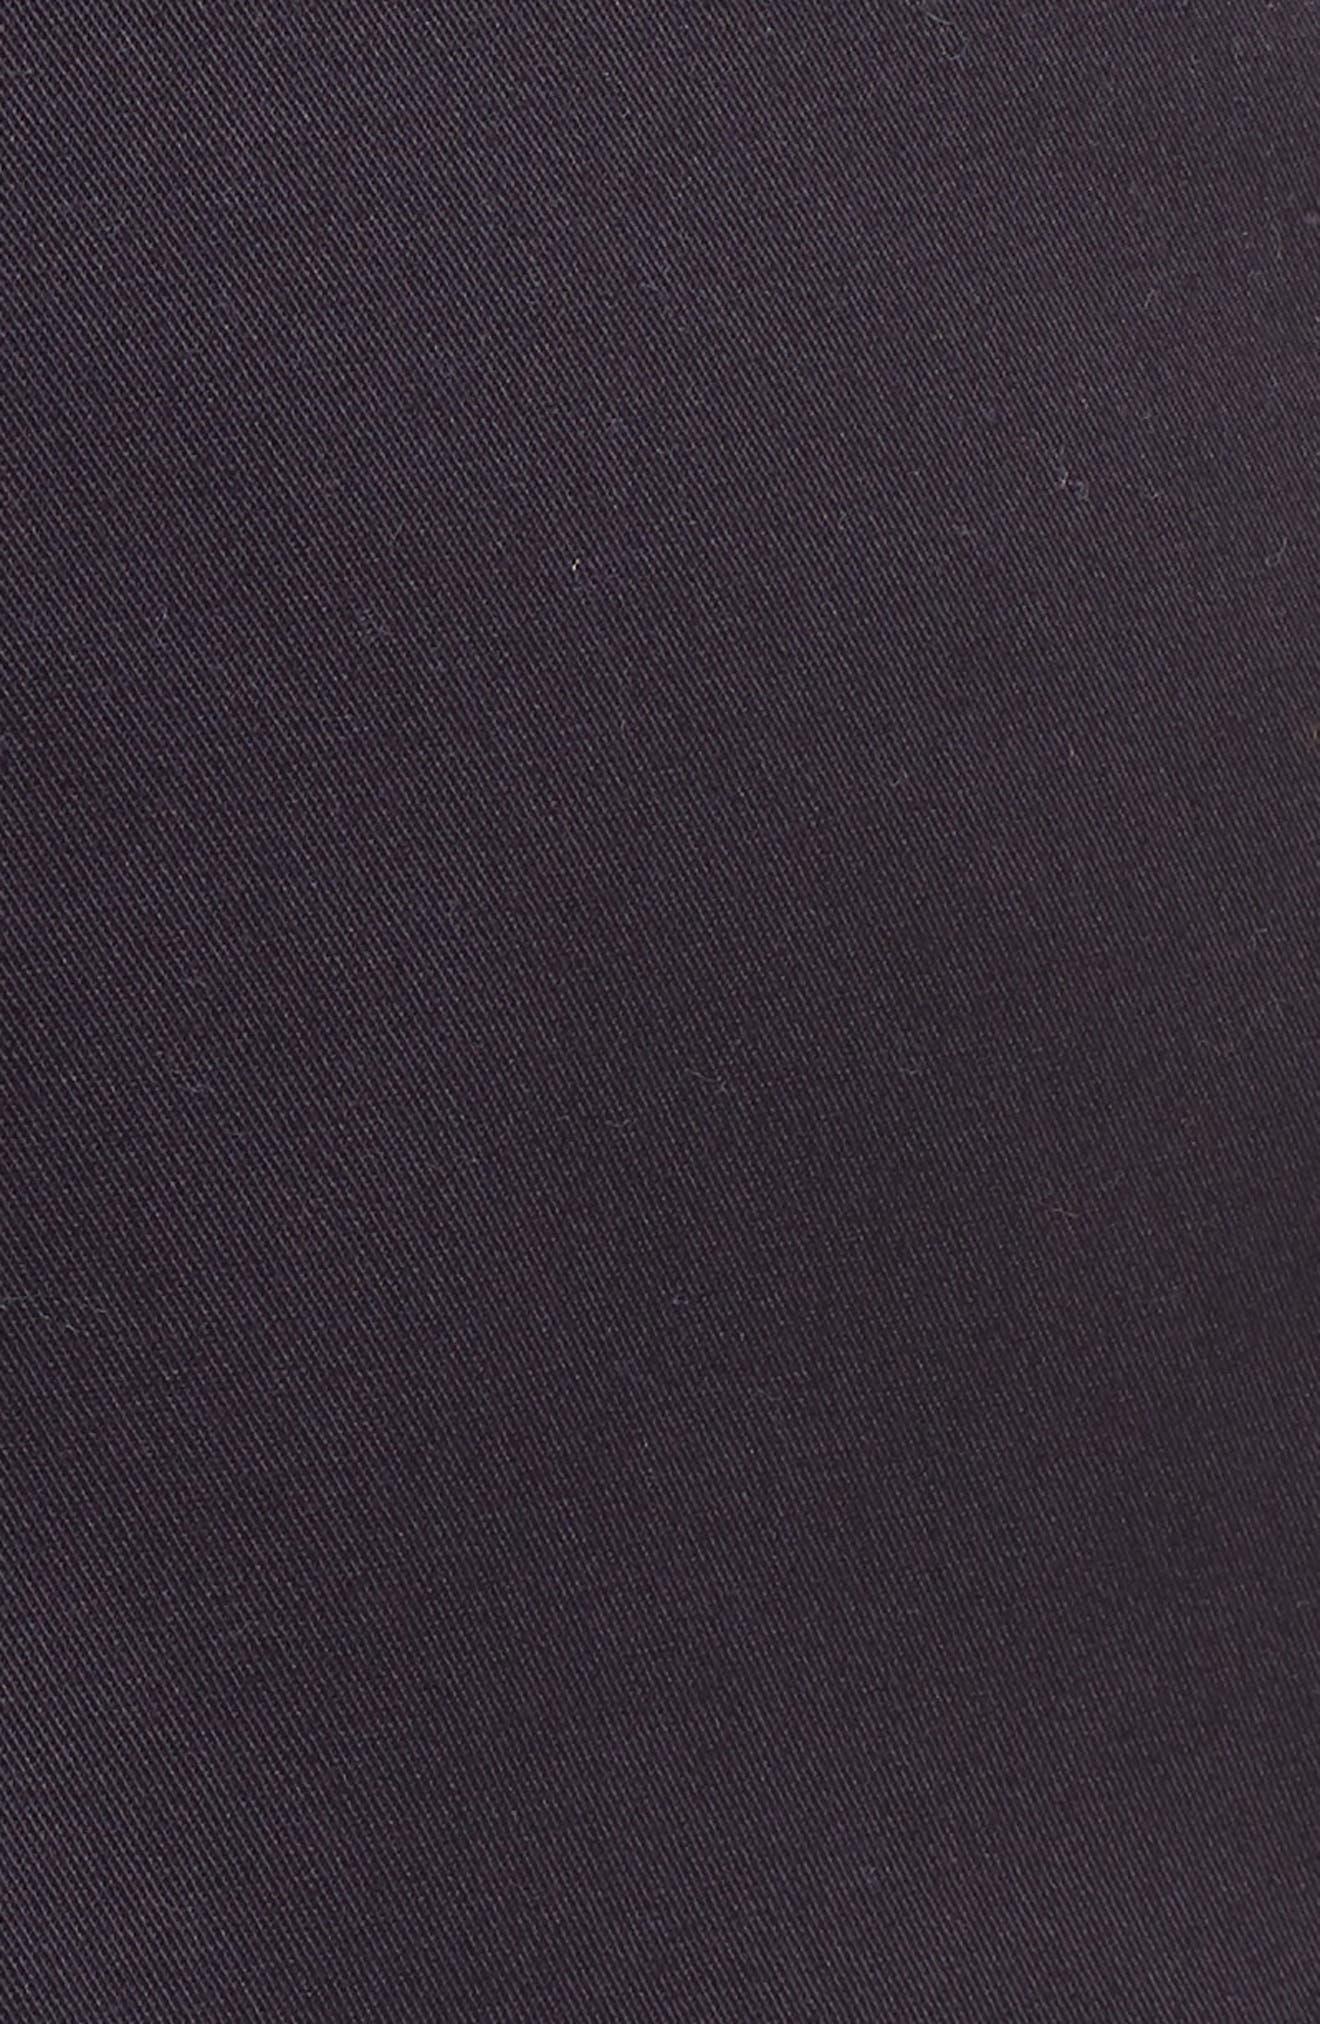 Vodan DC Slim Pants,                             Alternate thumbnail 5, color,                             Dark Naval Blue